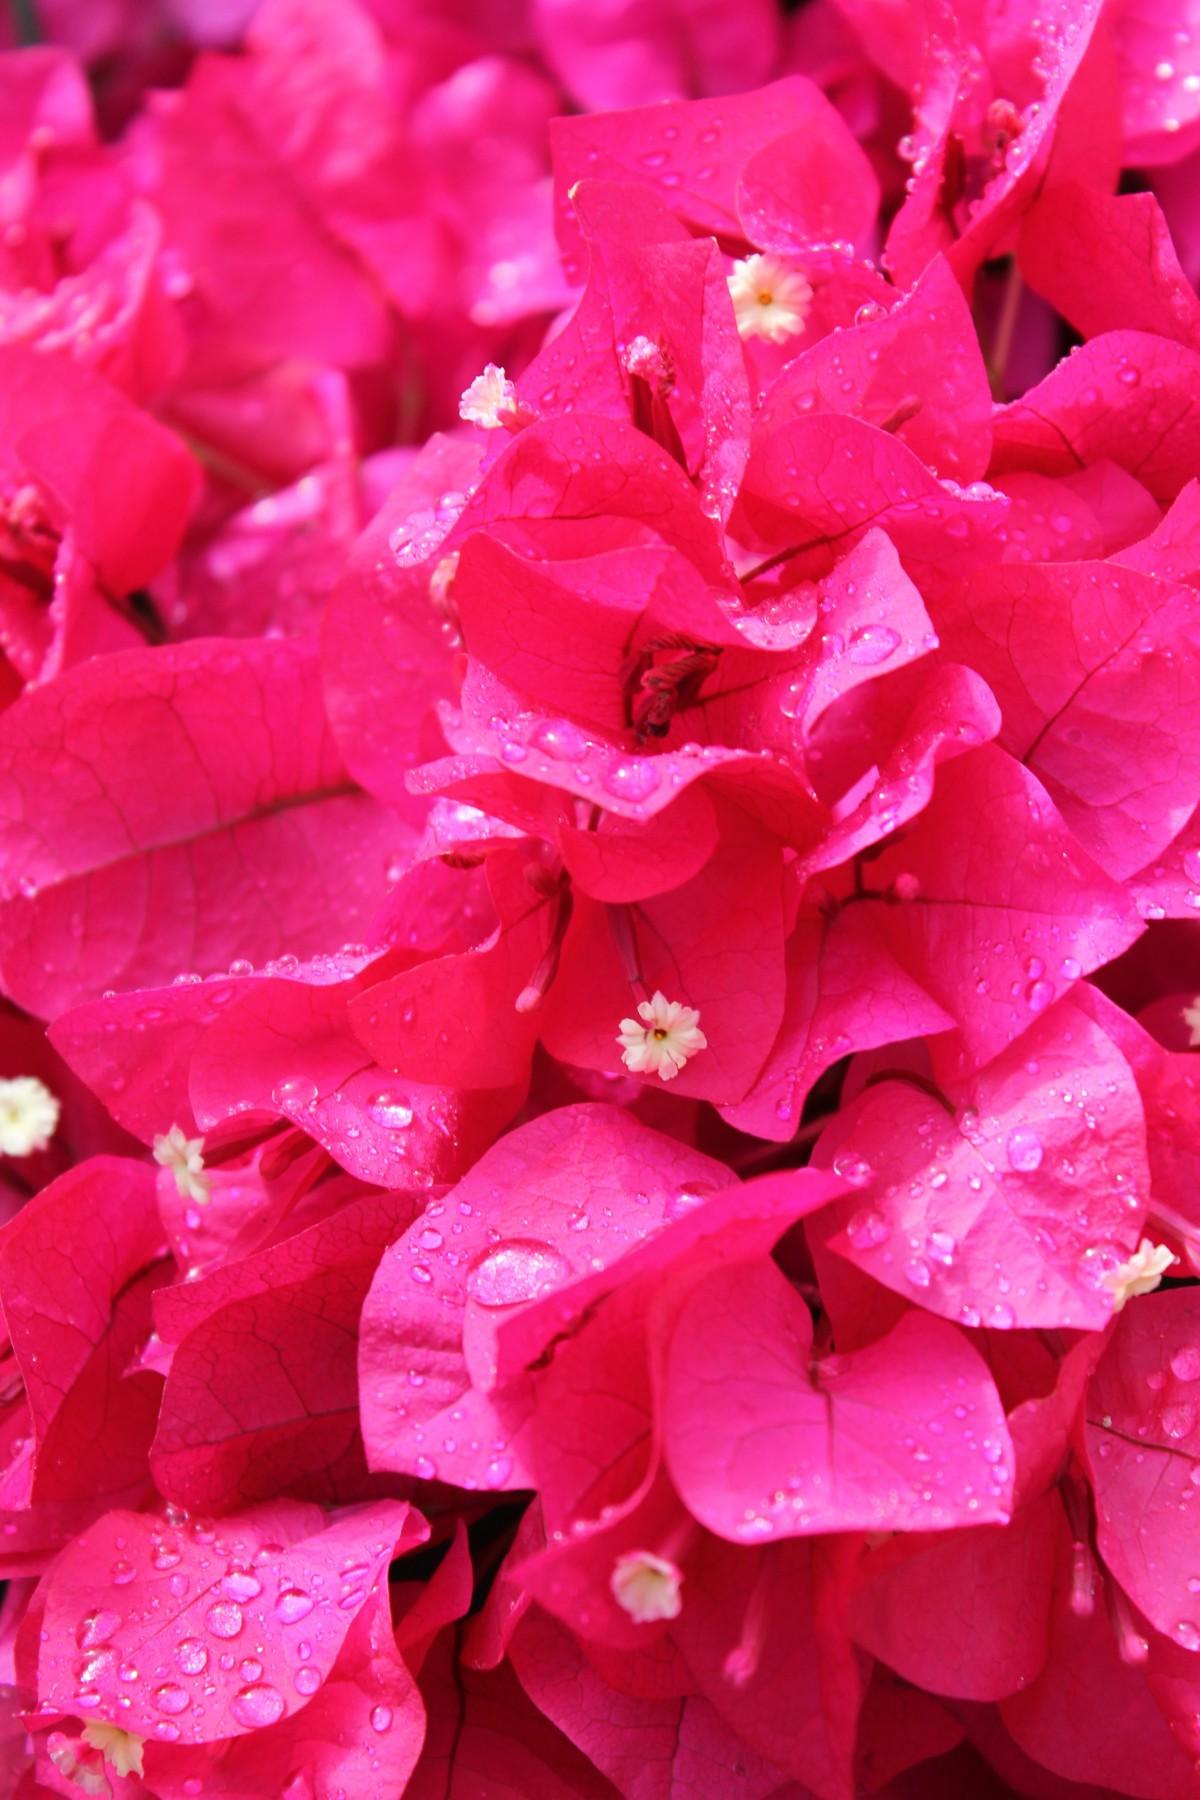 Free Images : blossom, texture, flower, petal, bloom ...